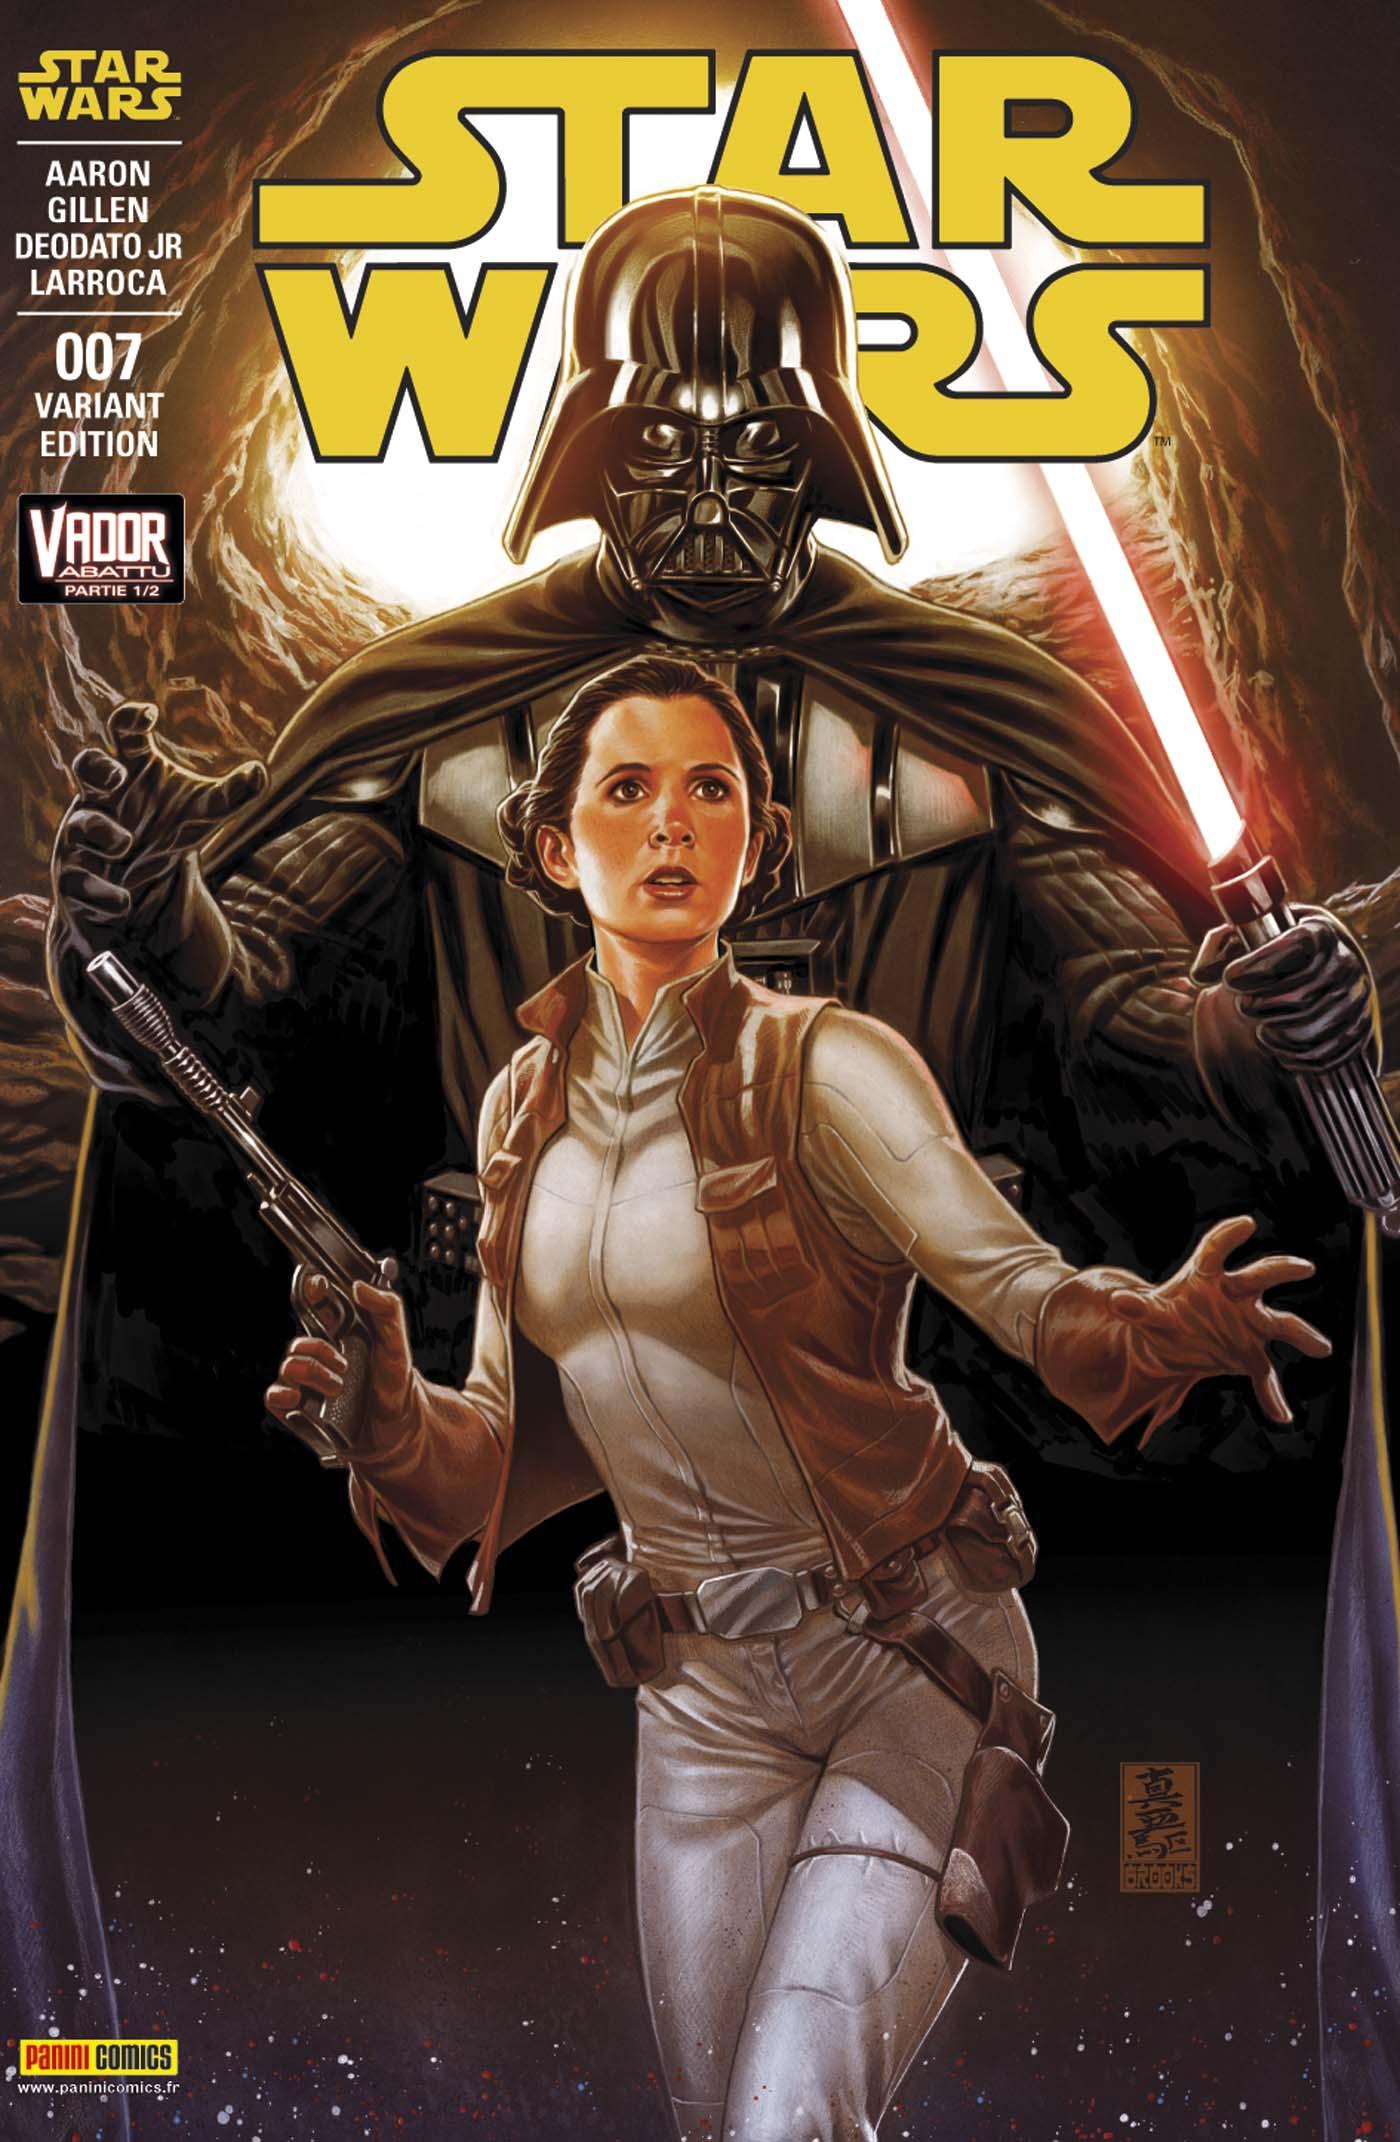 Star Wars Comics 7 - Couverture B